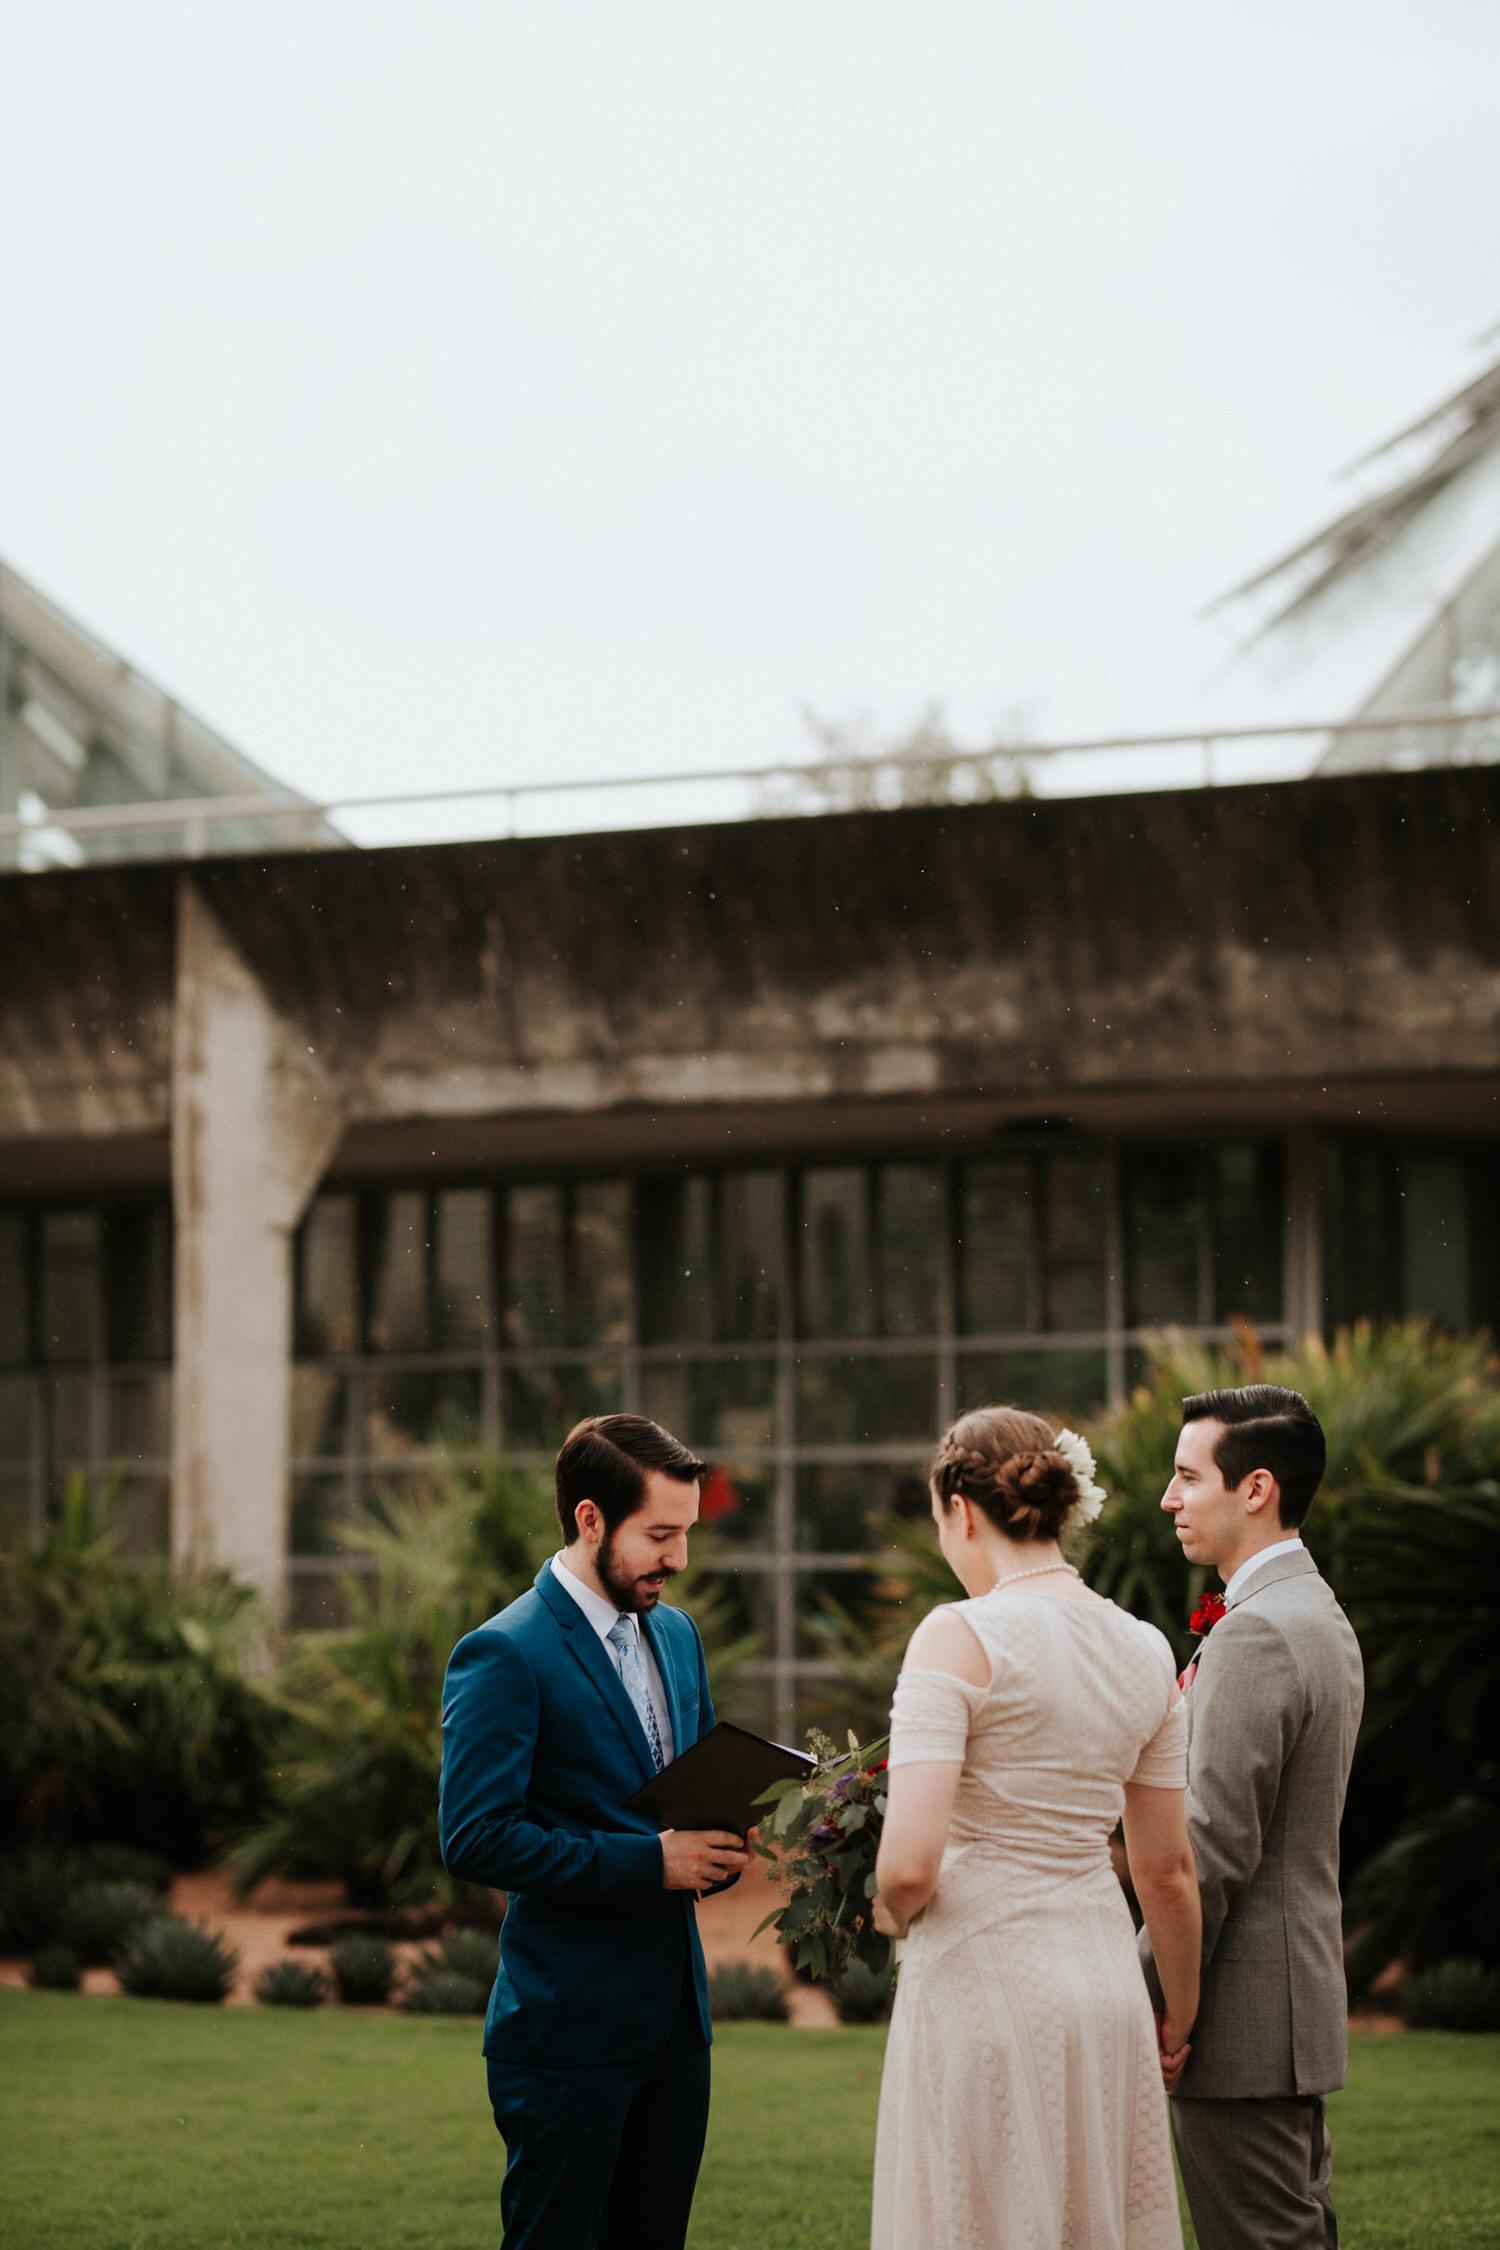 Couple getting married at San Antonio Botanical Garden Wedding